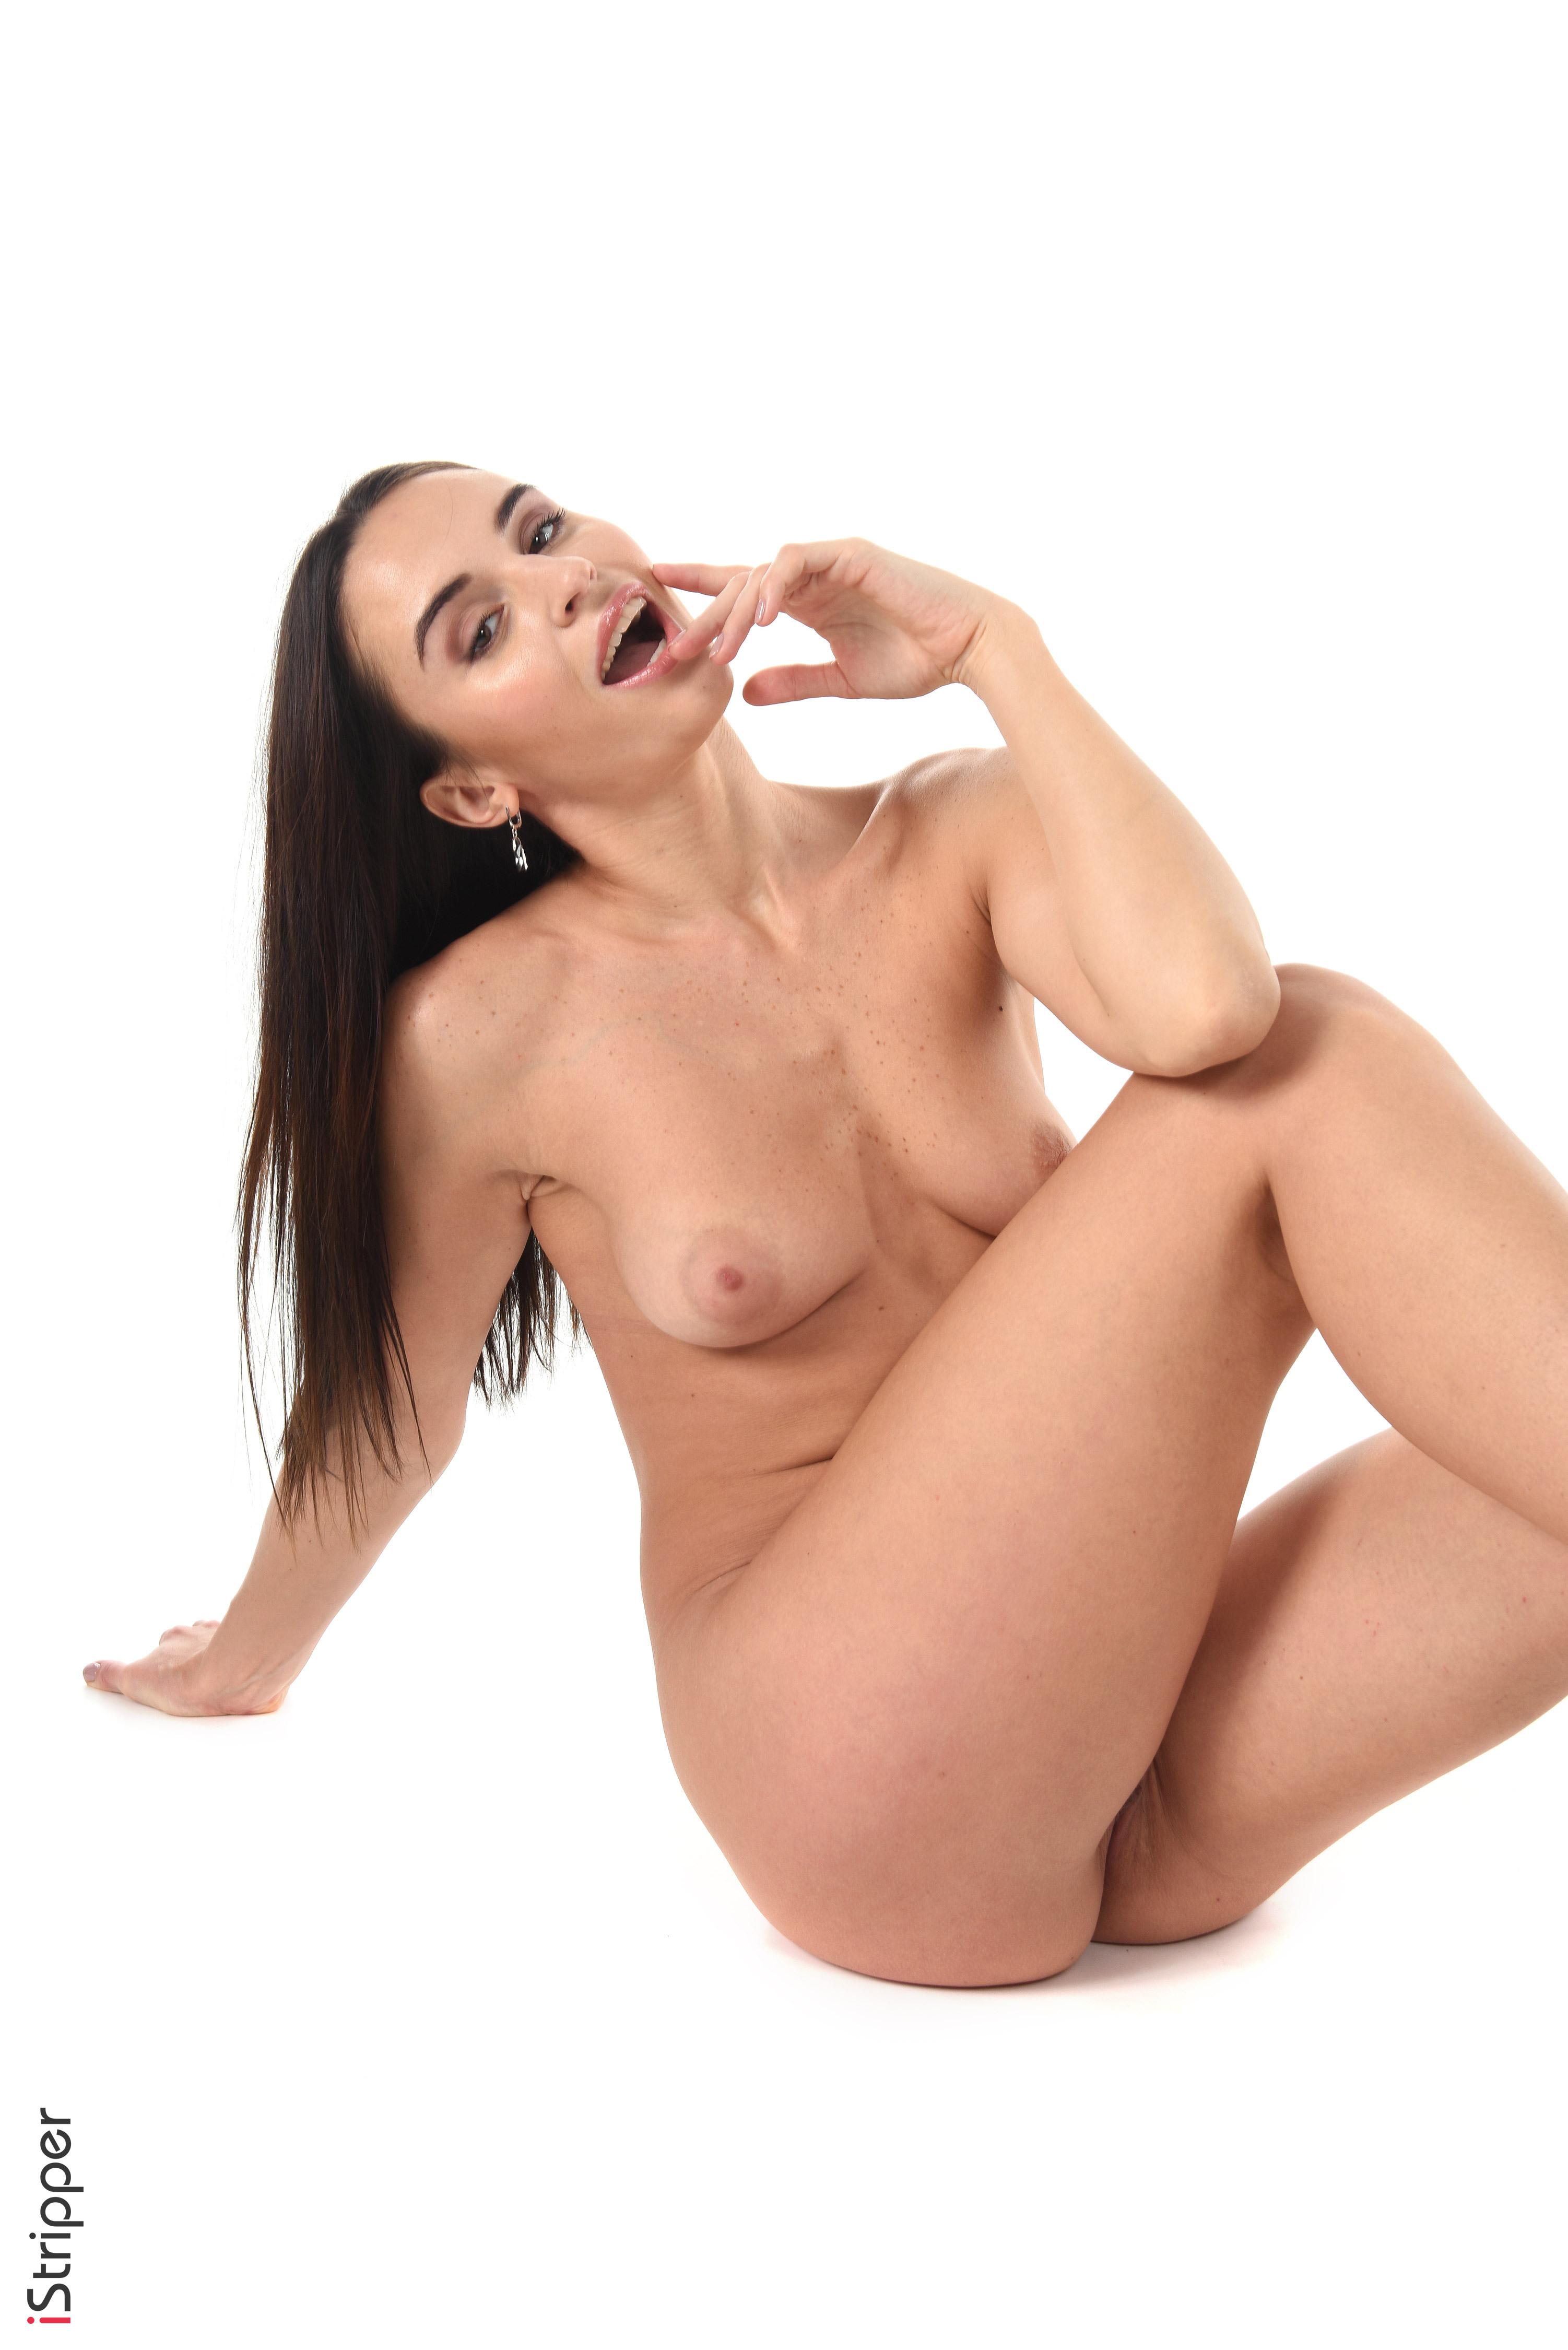 sexy brunettes Butt Luscious Cunt amateur Vagina masturbate insertion penetration